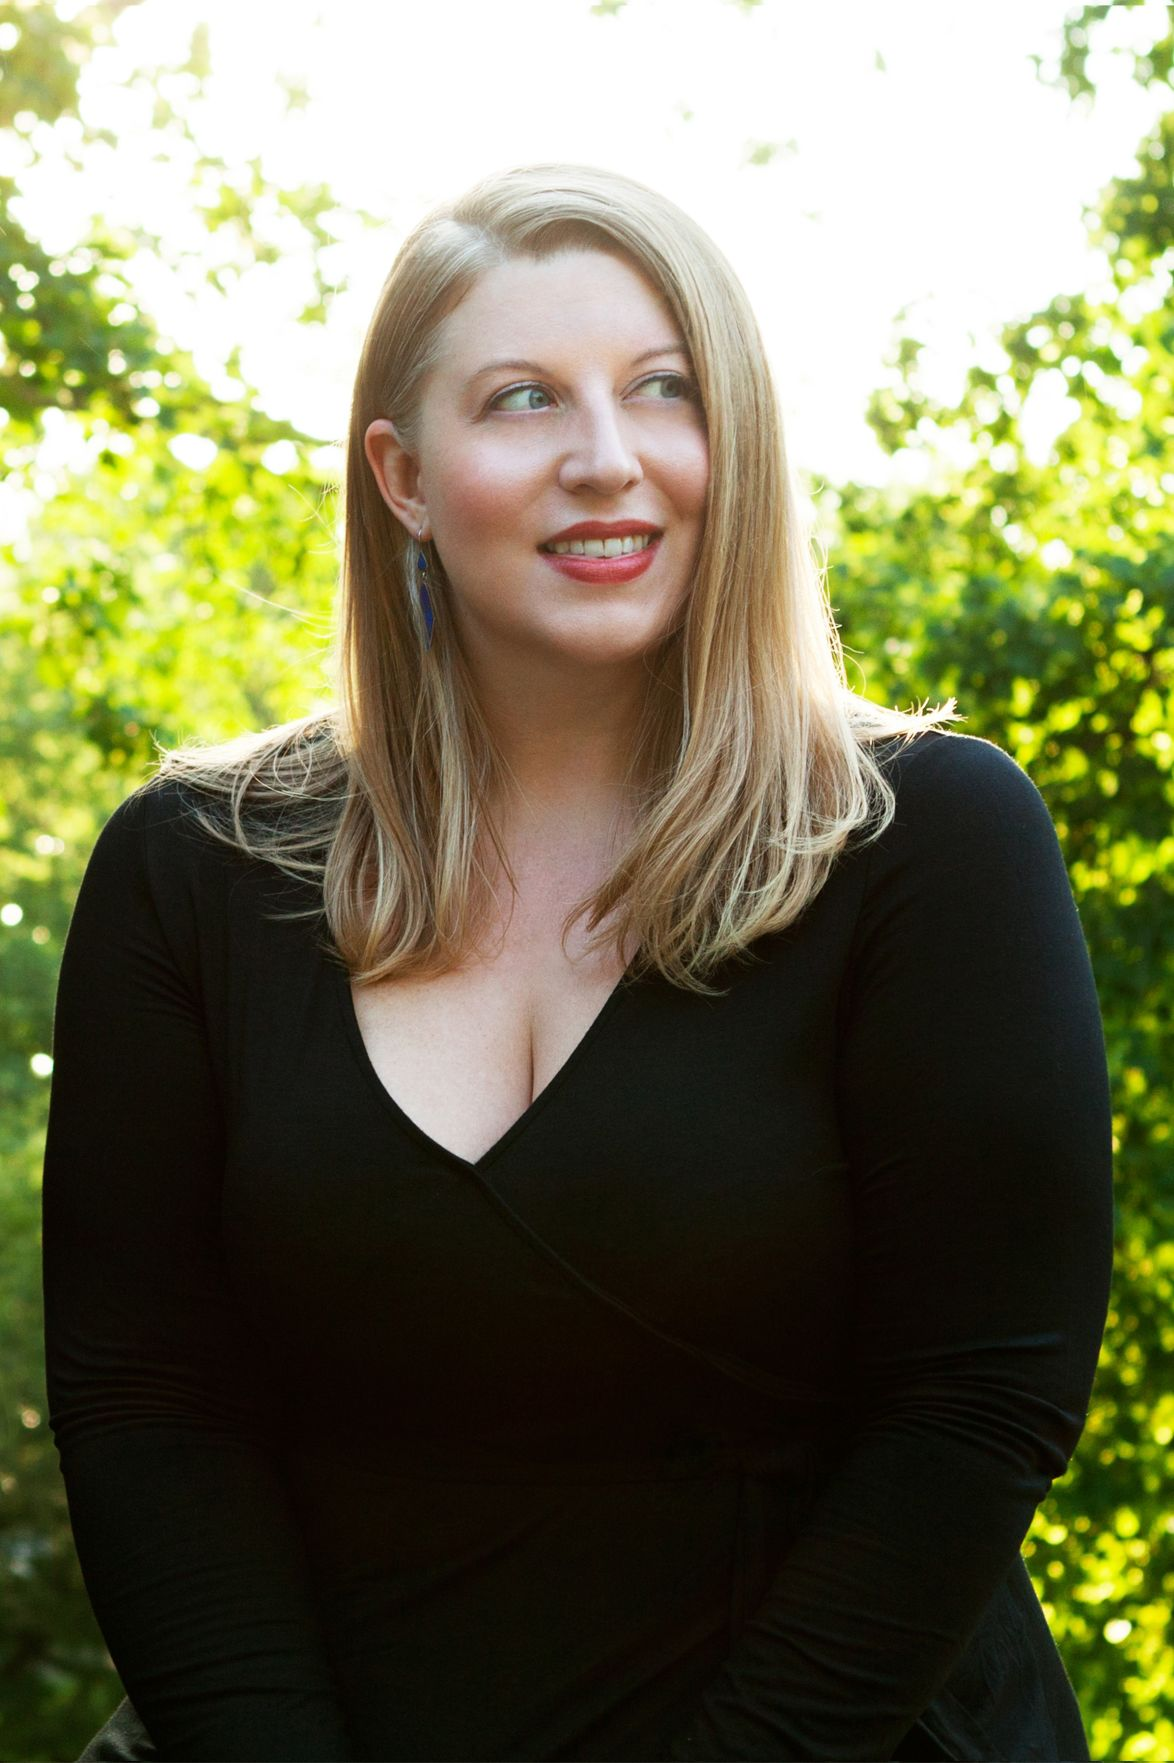 Soprano Laura Strickling